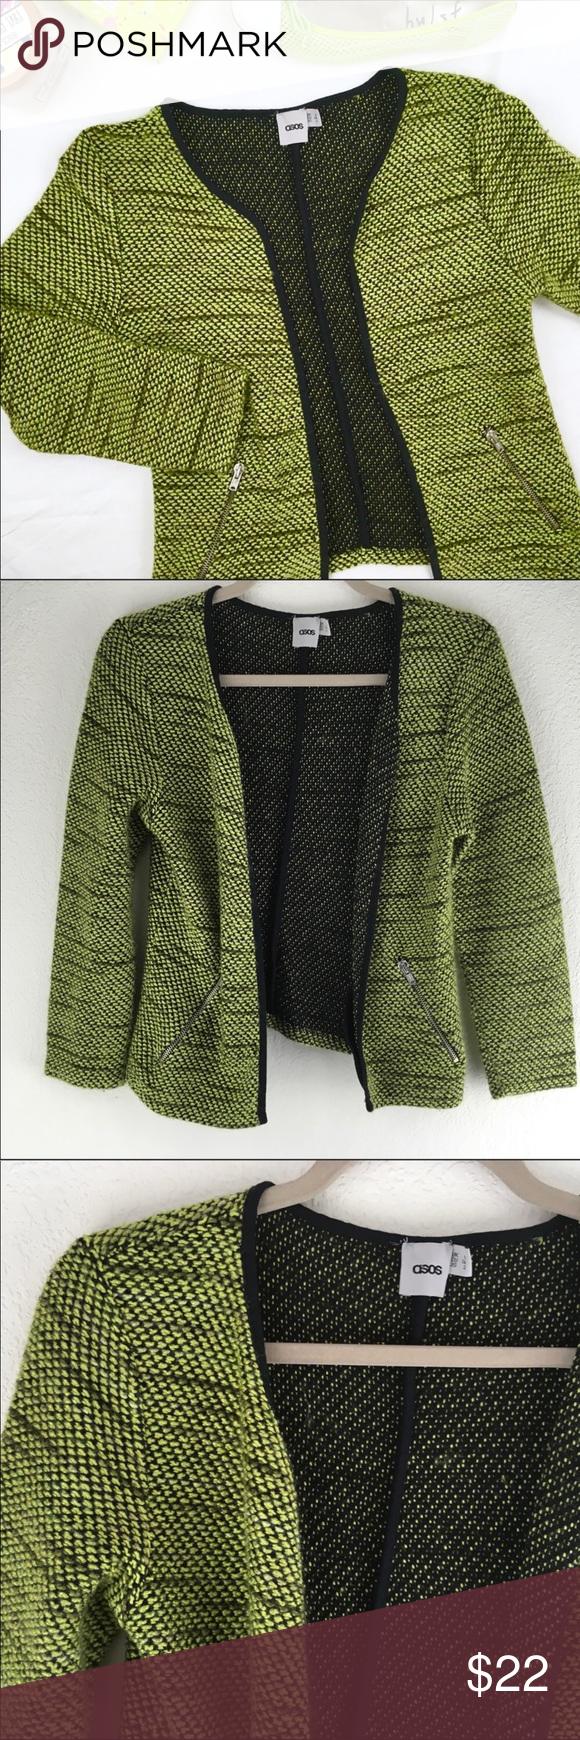 ASOS Neon Bouclé Open Sweater Jacket   Sweater jacket, Open